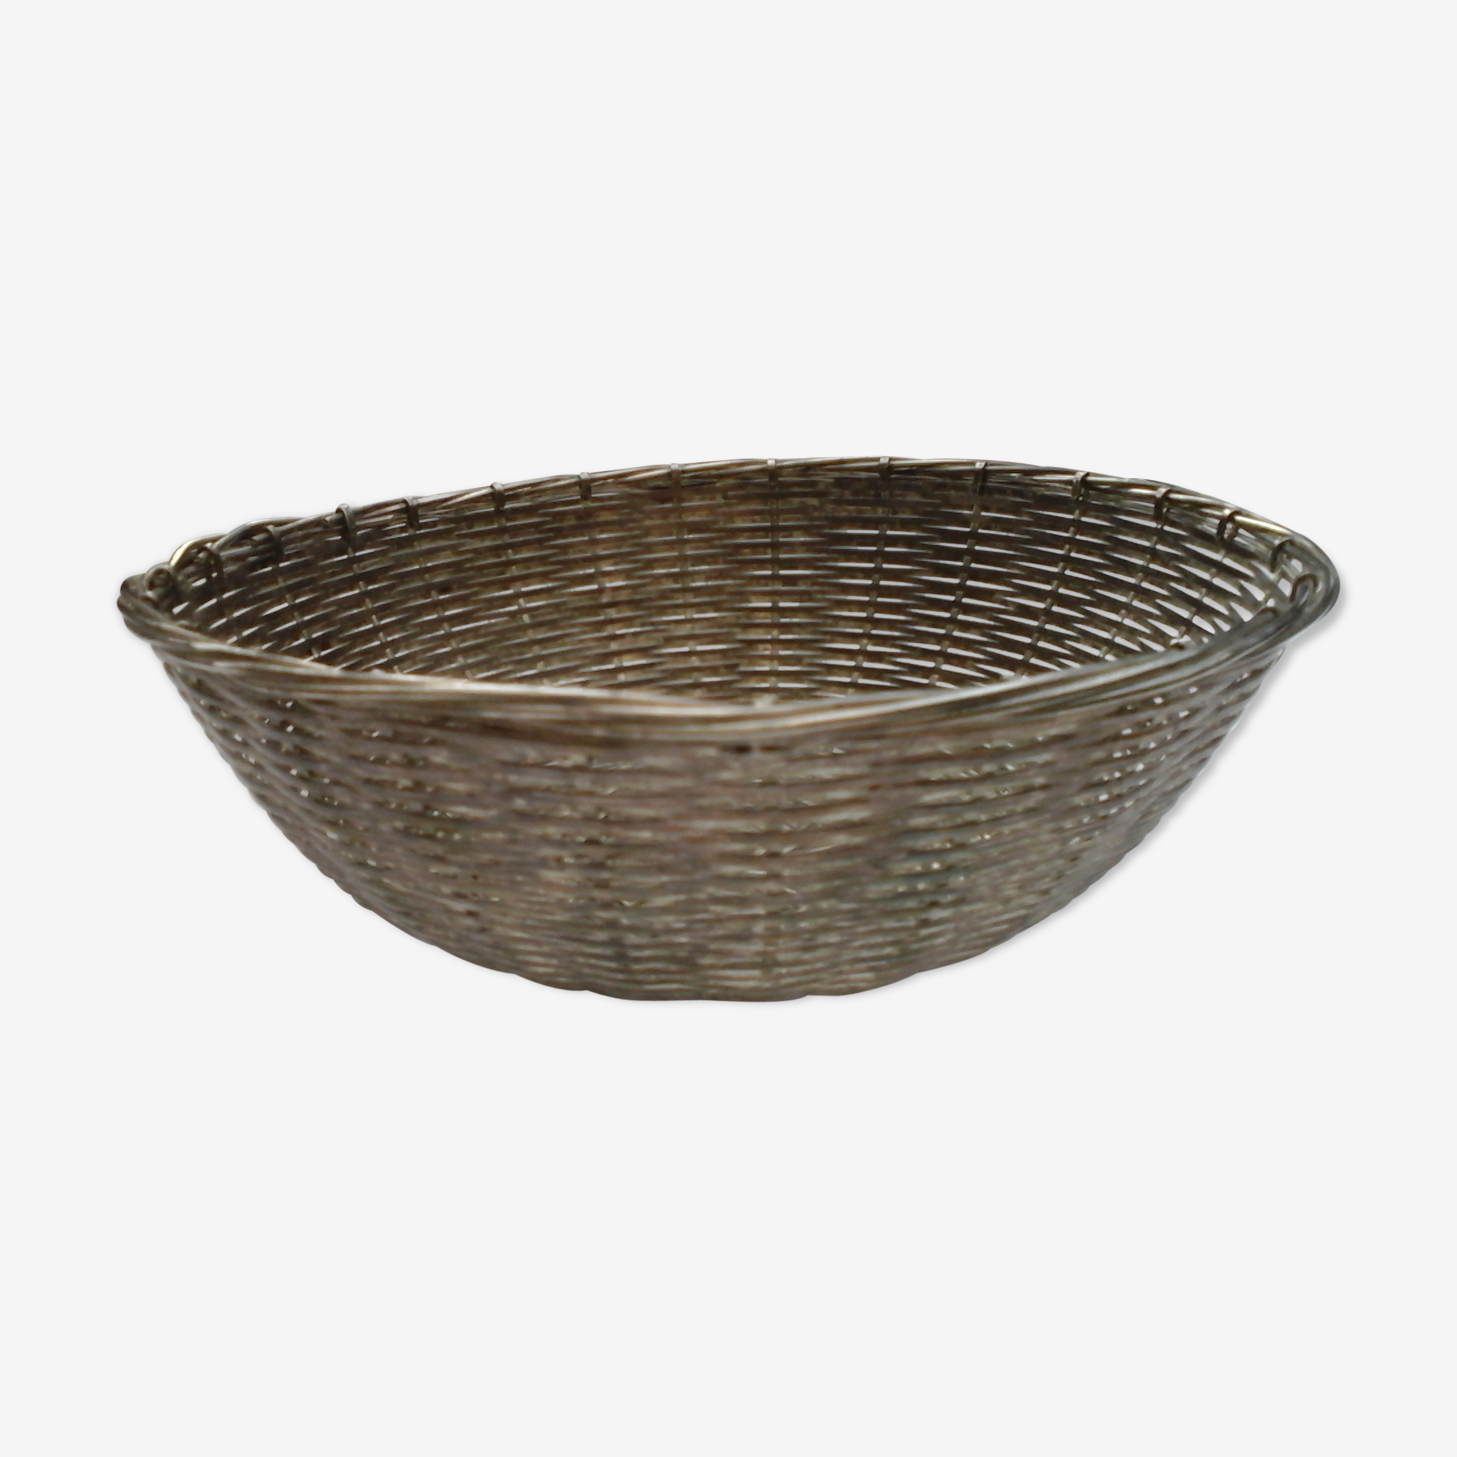 Braided metal basket